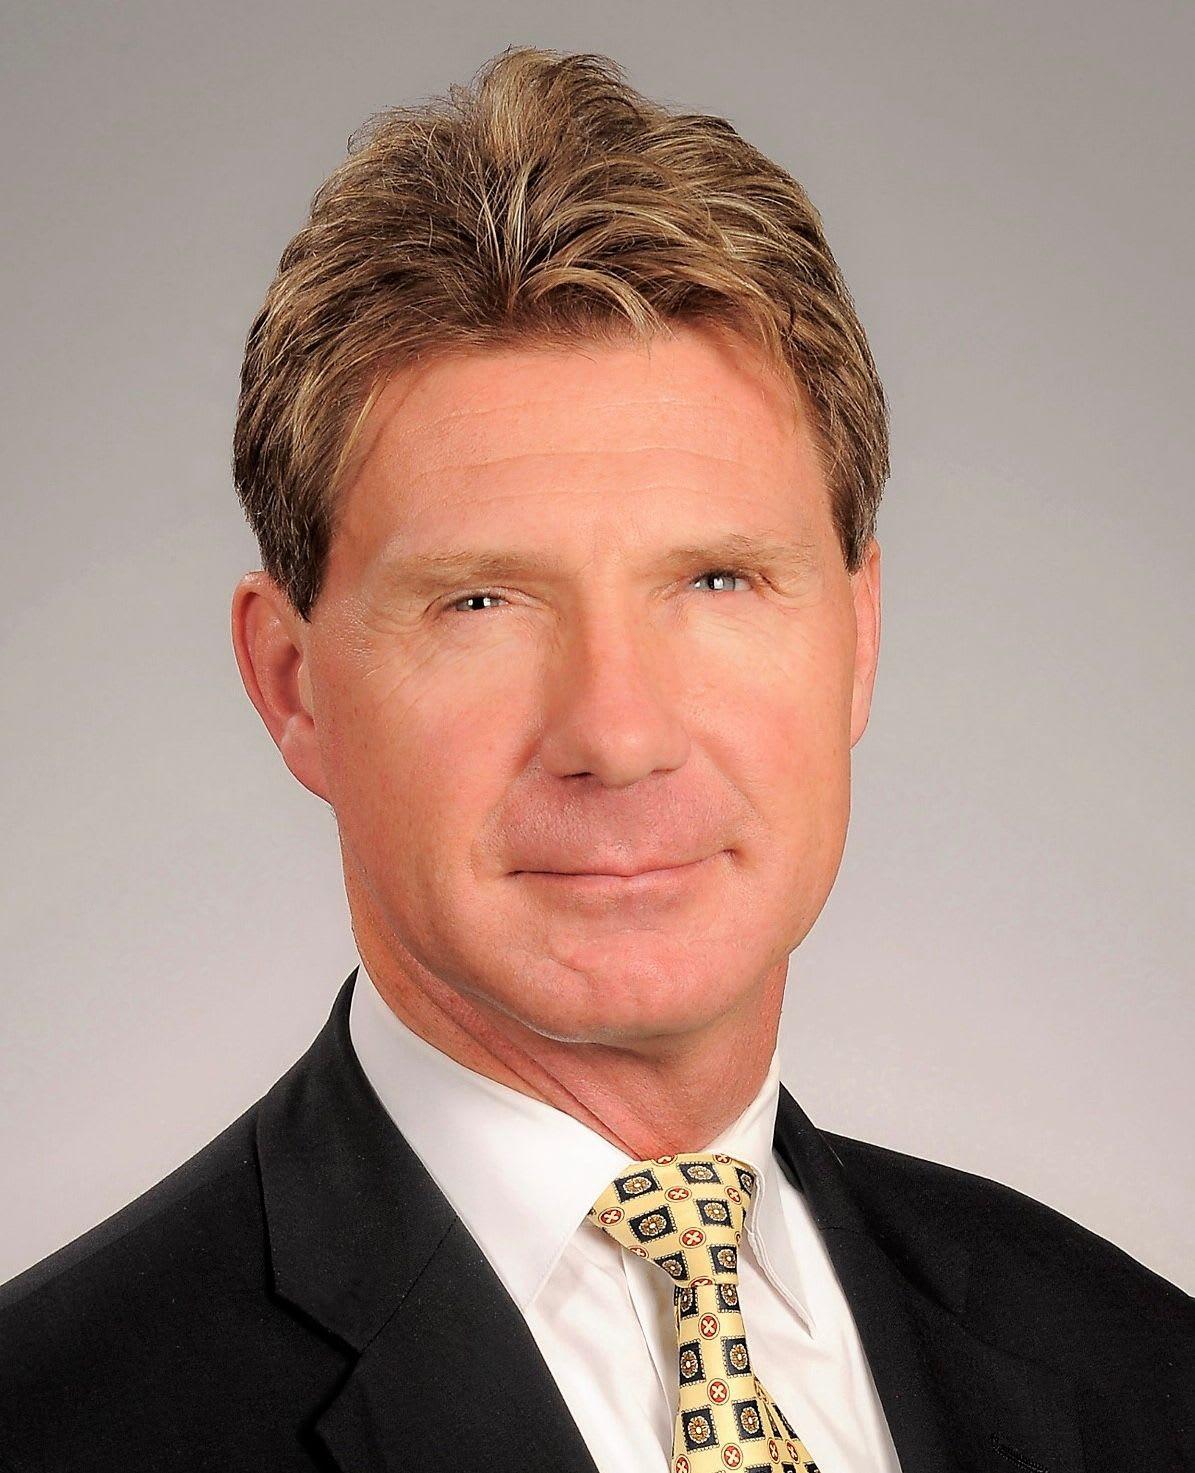 Robert  | Executive Director of Hospitality